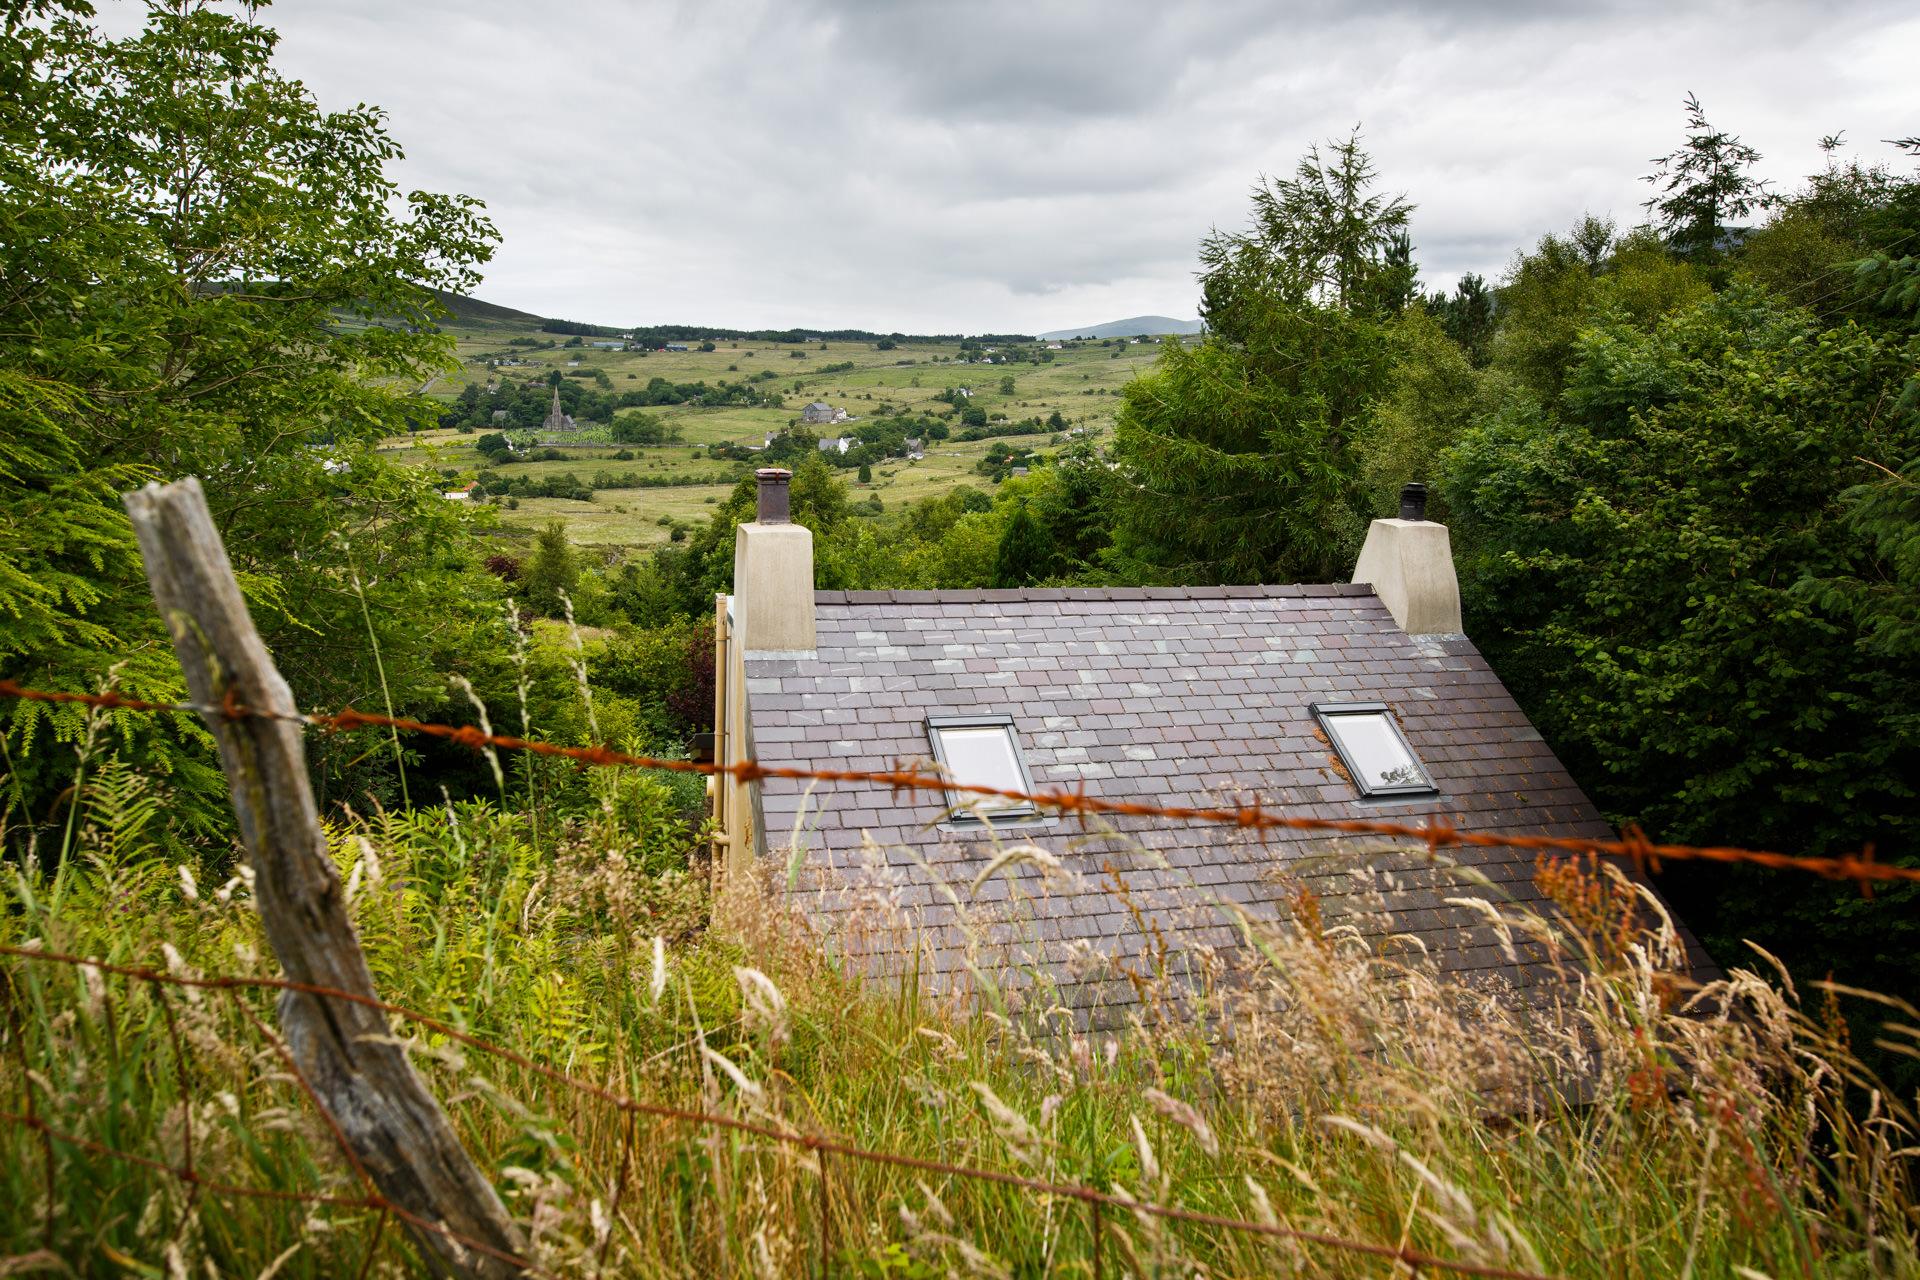 The house is in Gallt-y-foel, halfway between Deiniolen and Dinorwig.